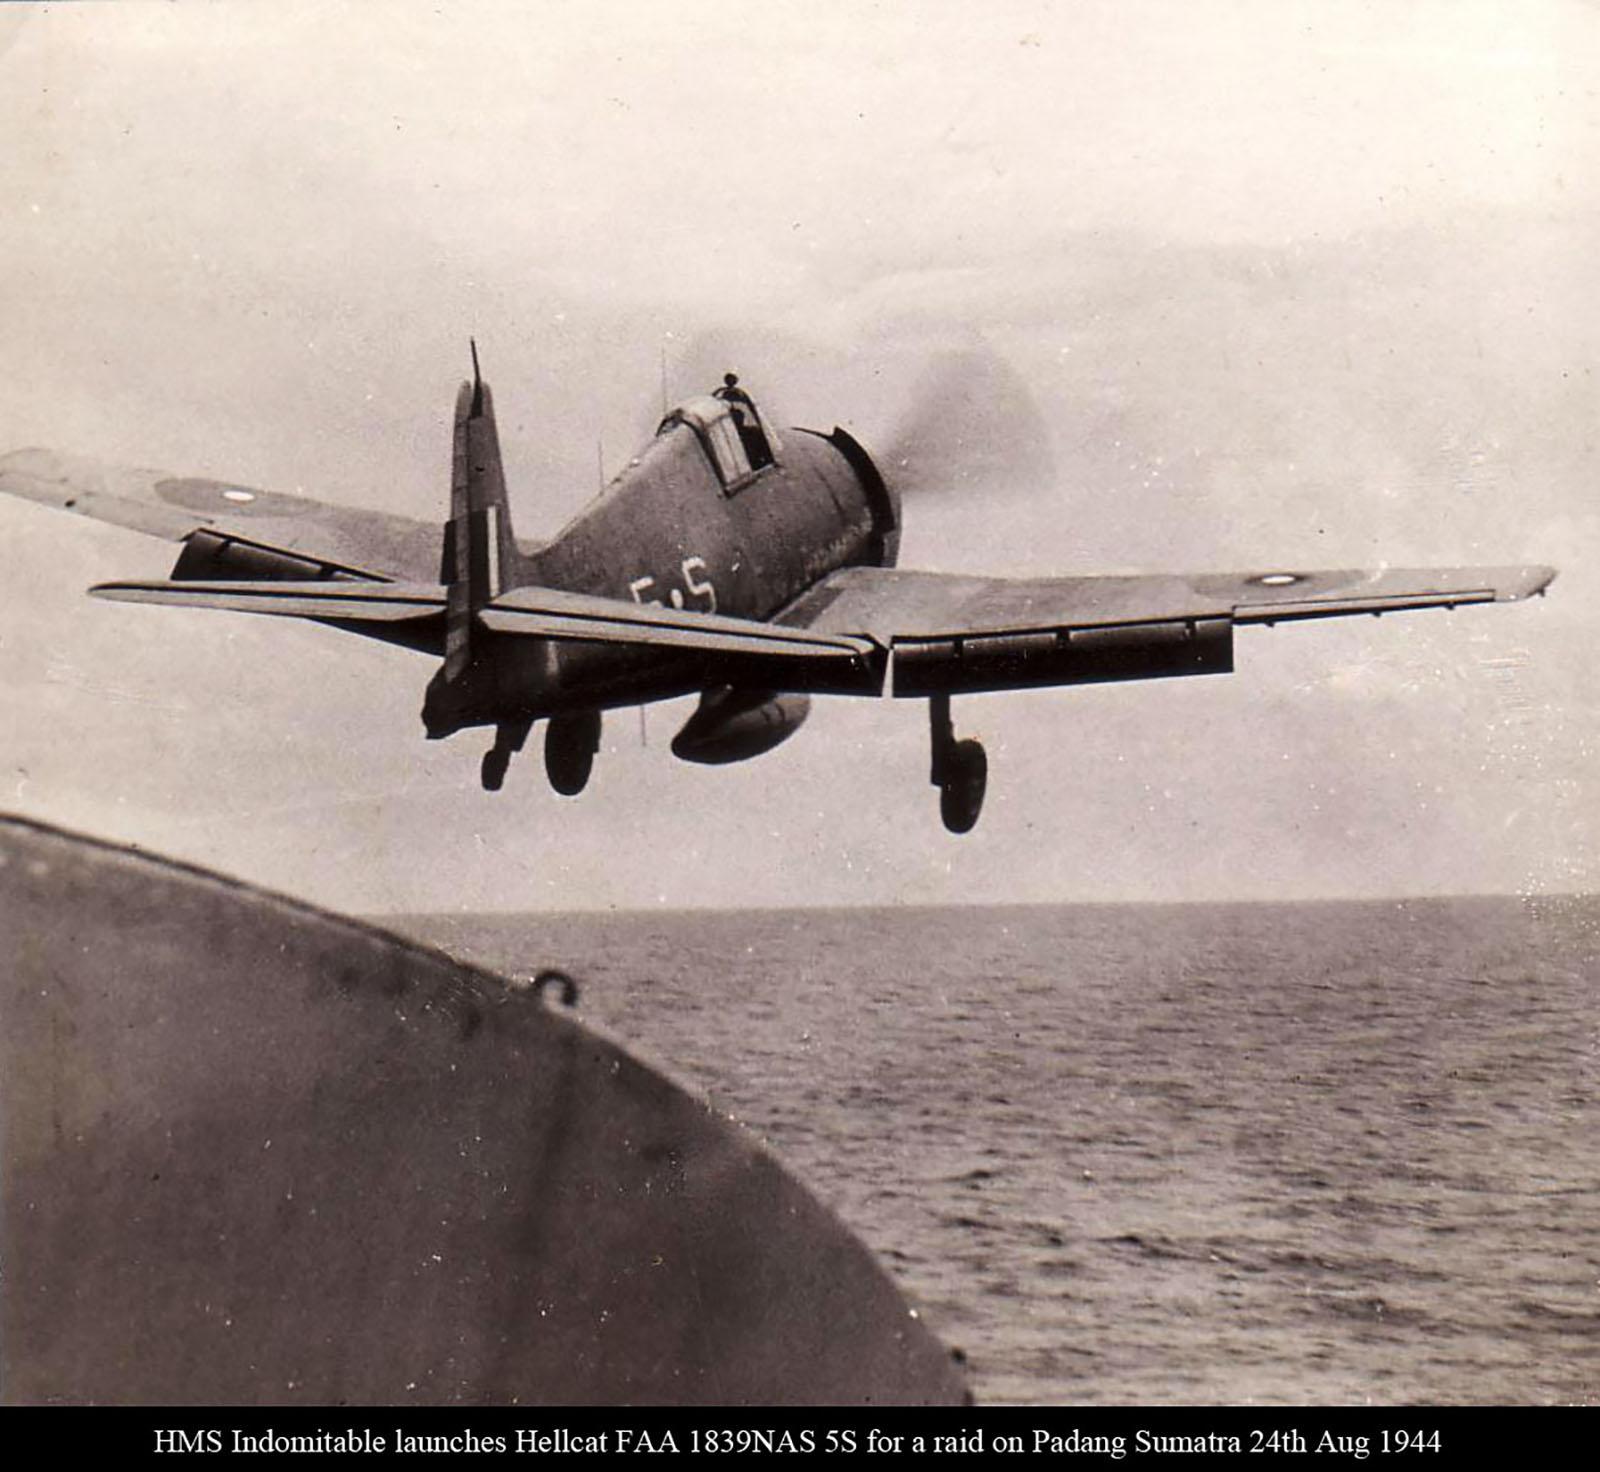 HMS Indomitable launches Hellcat FAA 1839NAS 5S for a raid on Padang Sumatra Aug 24 1944 01